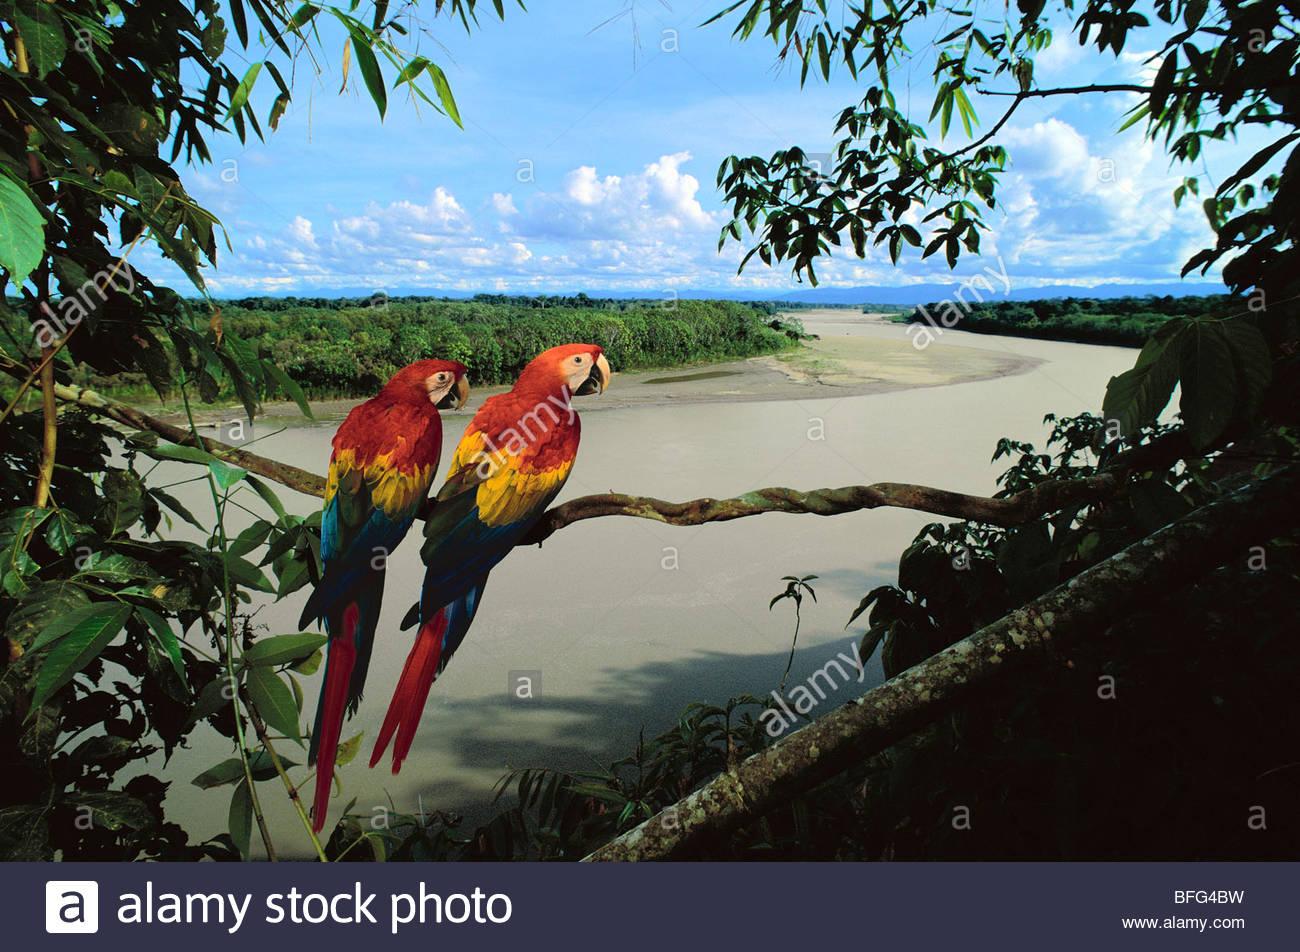 Scarlet macaws overlooking Tambopata River, Ara macao, Tambopata National Reserve, Peru - Stock Image